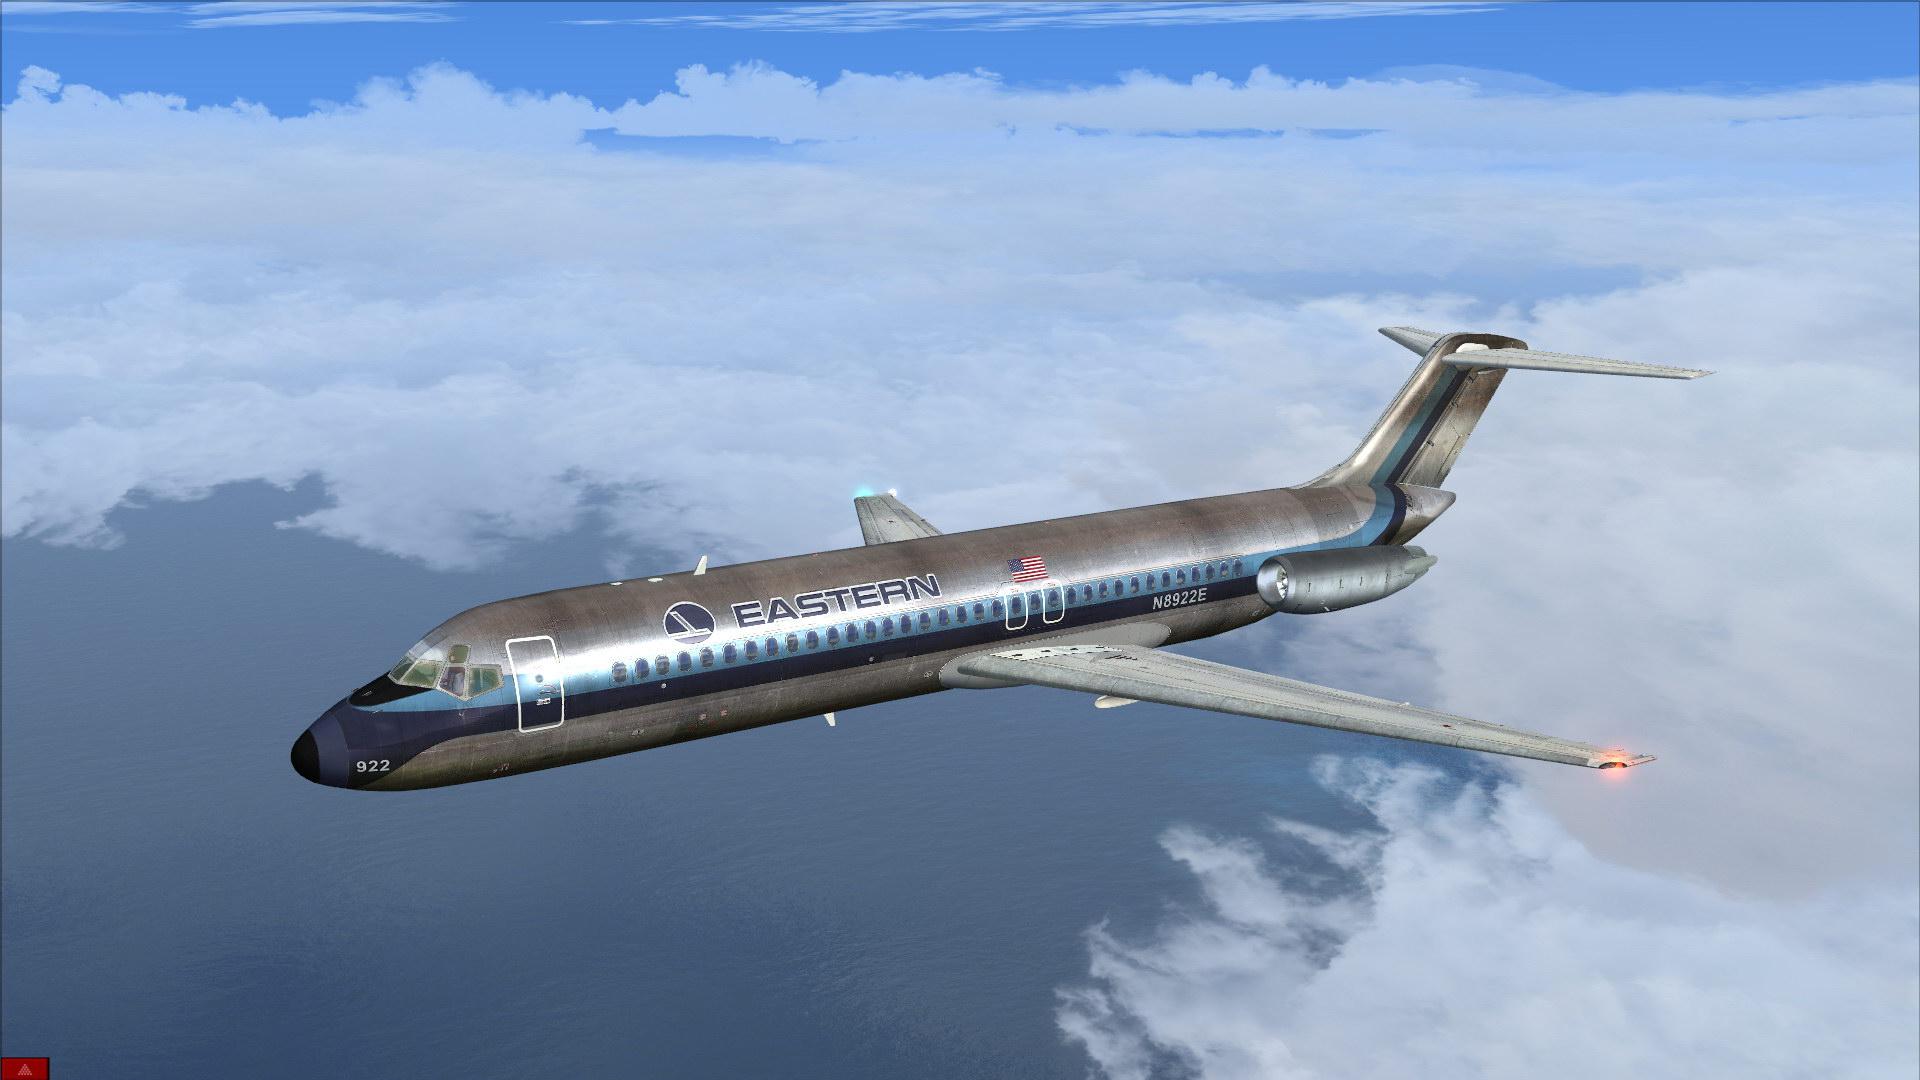 Fsx Wallpaper Hd Flight1 Com Flight Simulator Add Ons For Fsx And Prepar3d